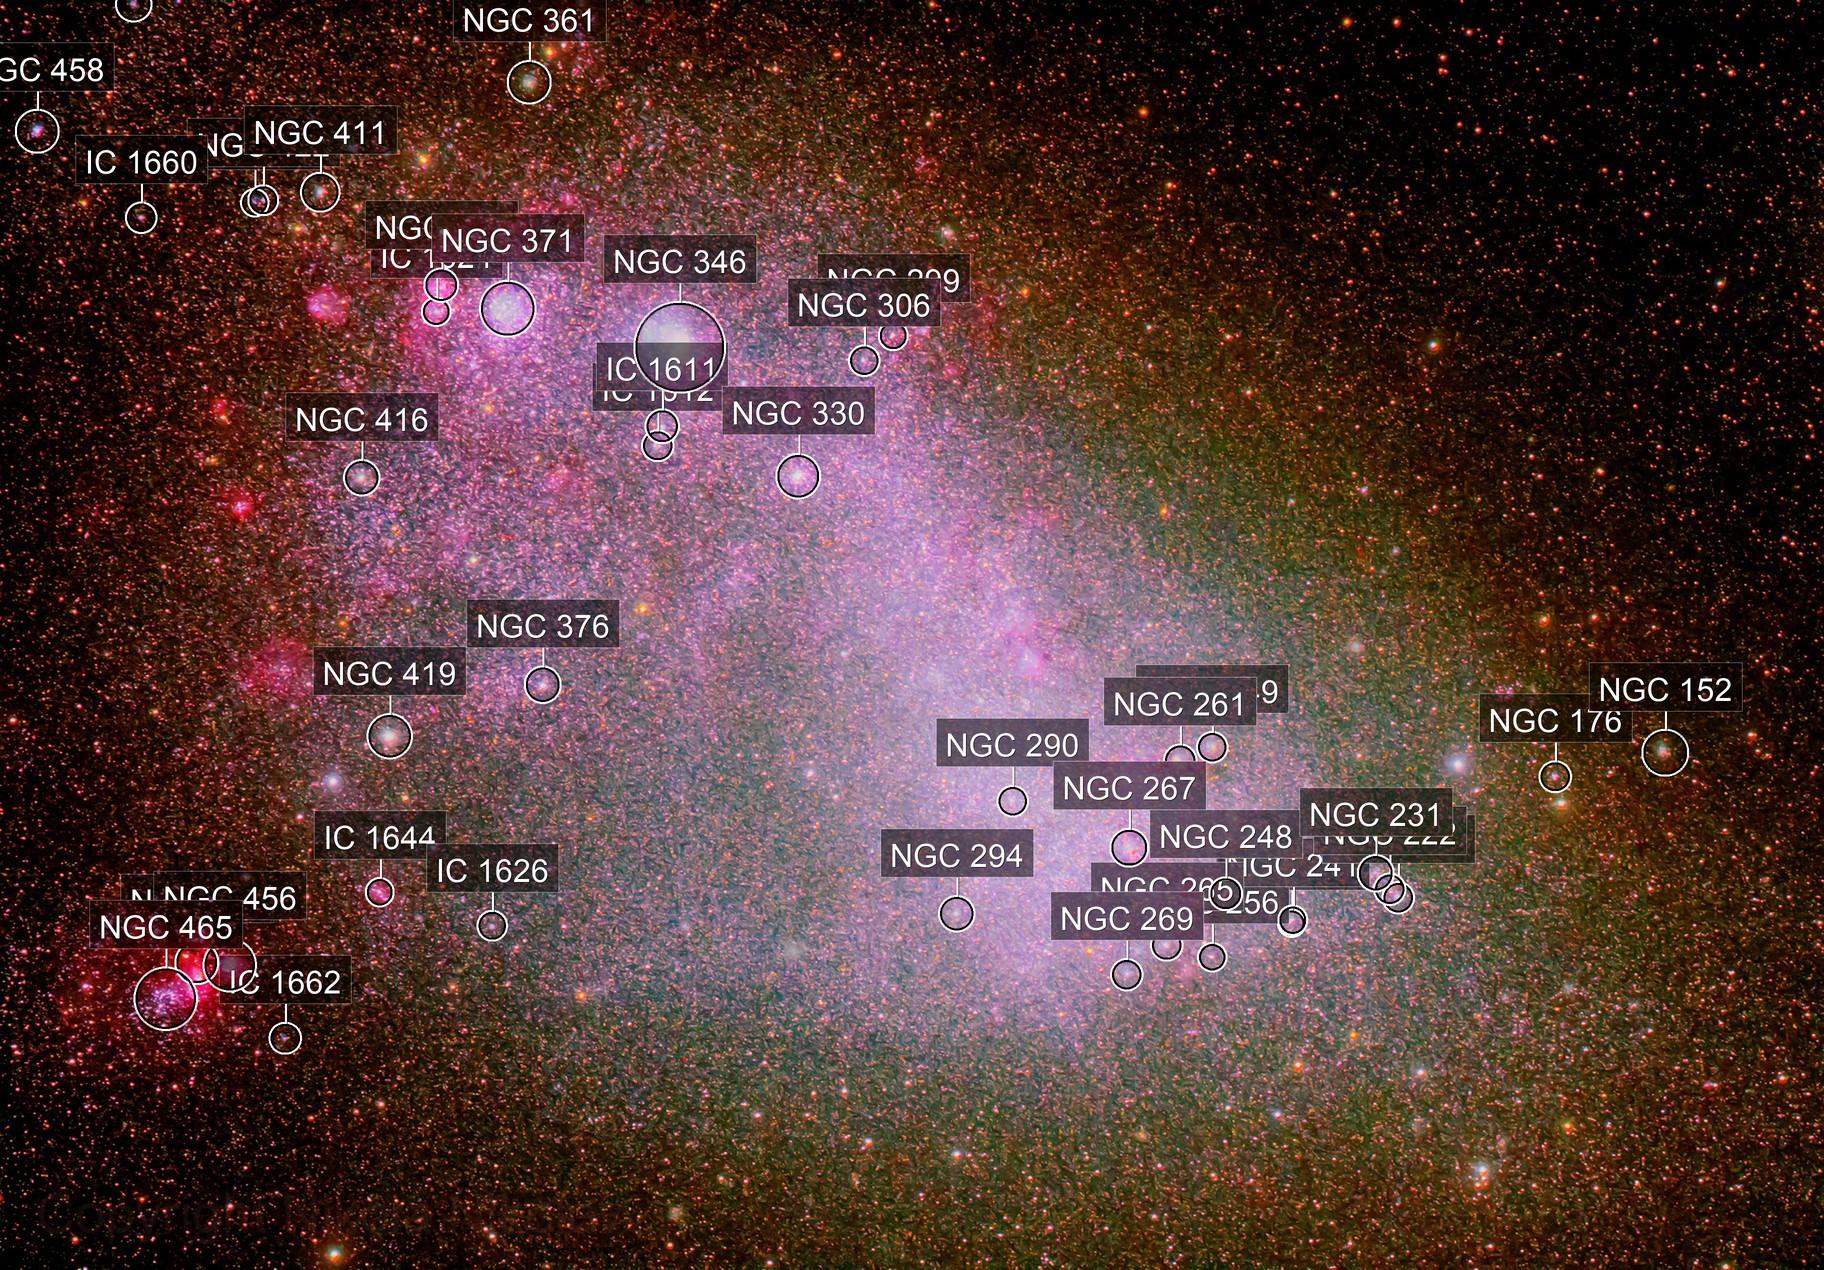 NGC 292 (The Small Magellanic Cloud)